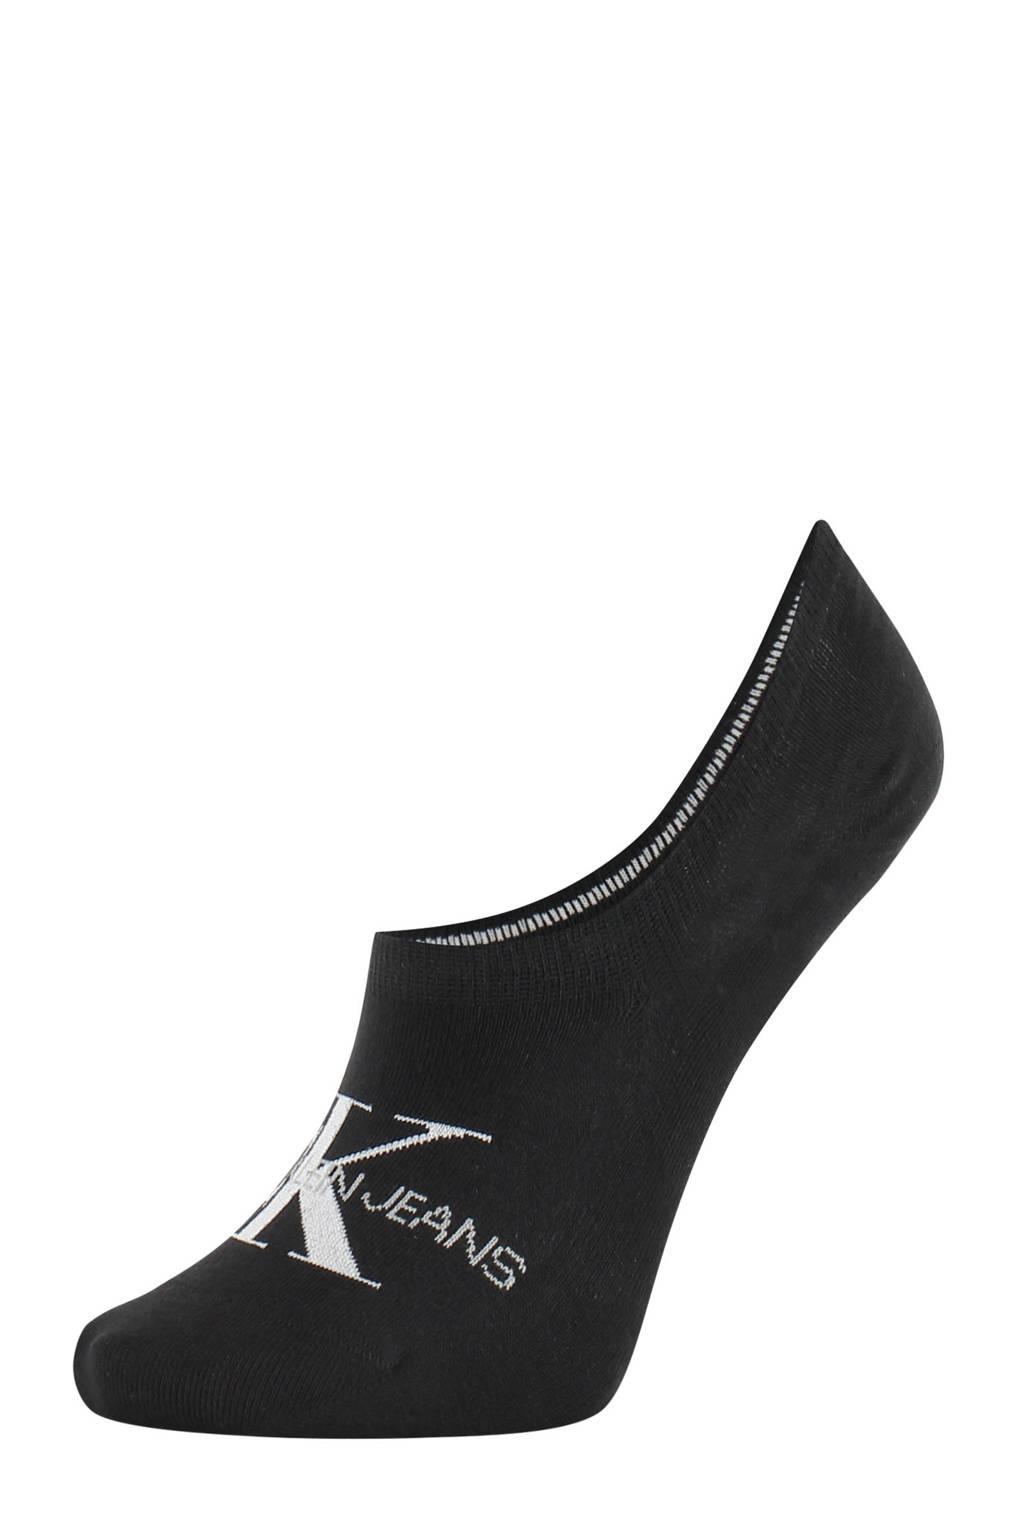 CALVIN KLEIN no-show sneaker sokken, Zwart/wit